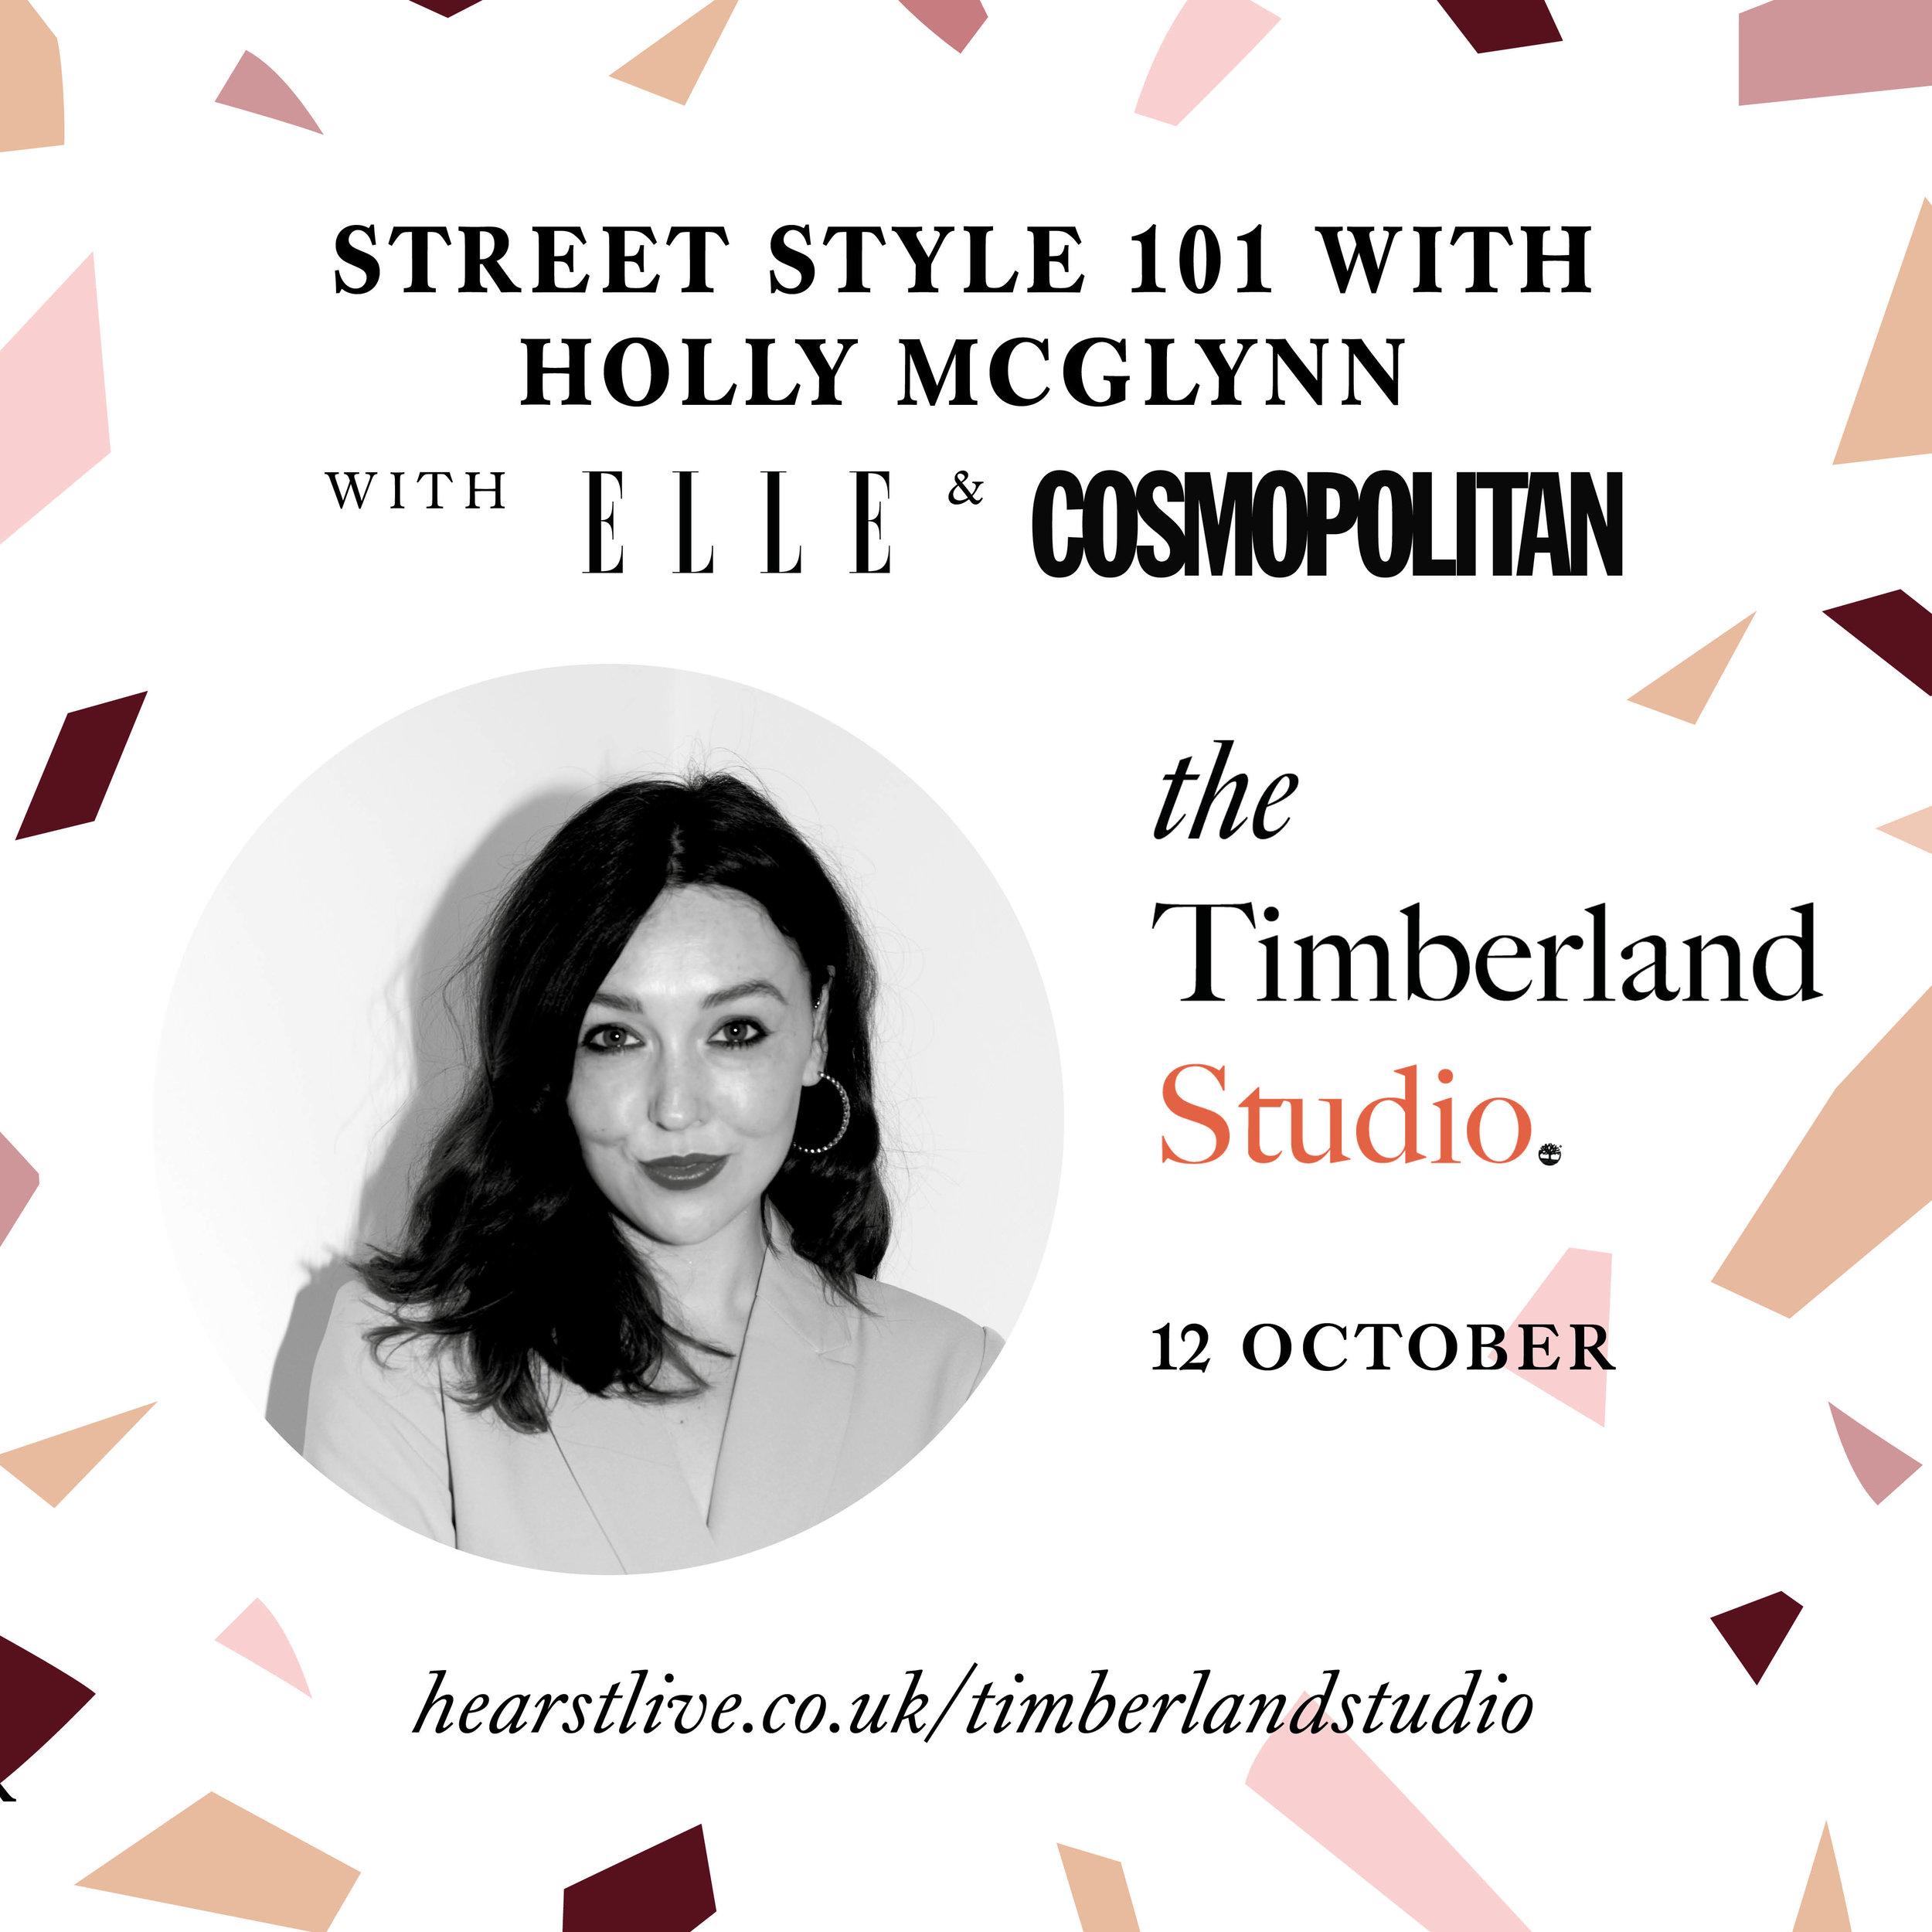 Street style 101 panel - The Timberland Studio